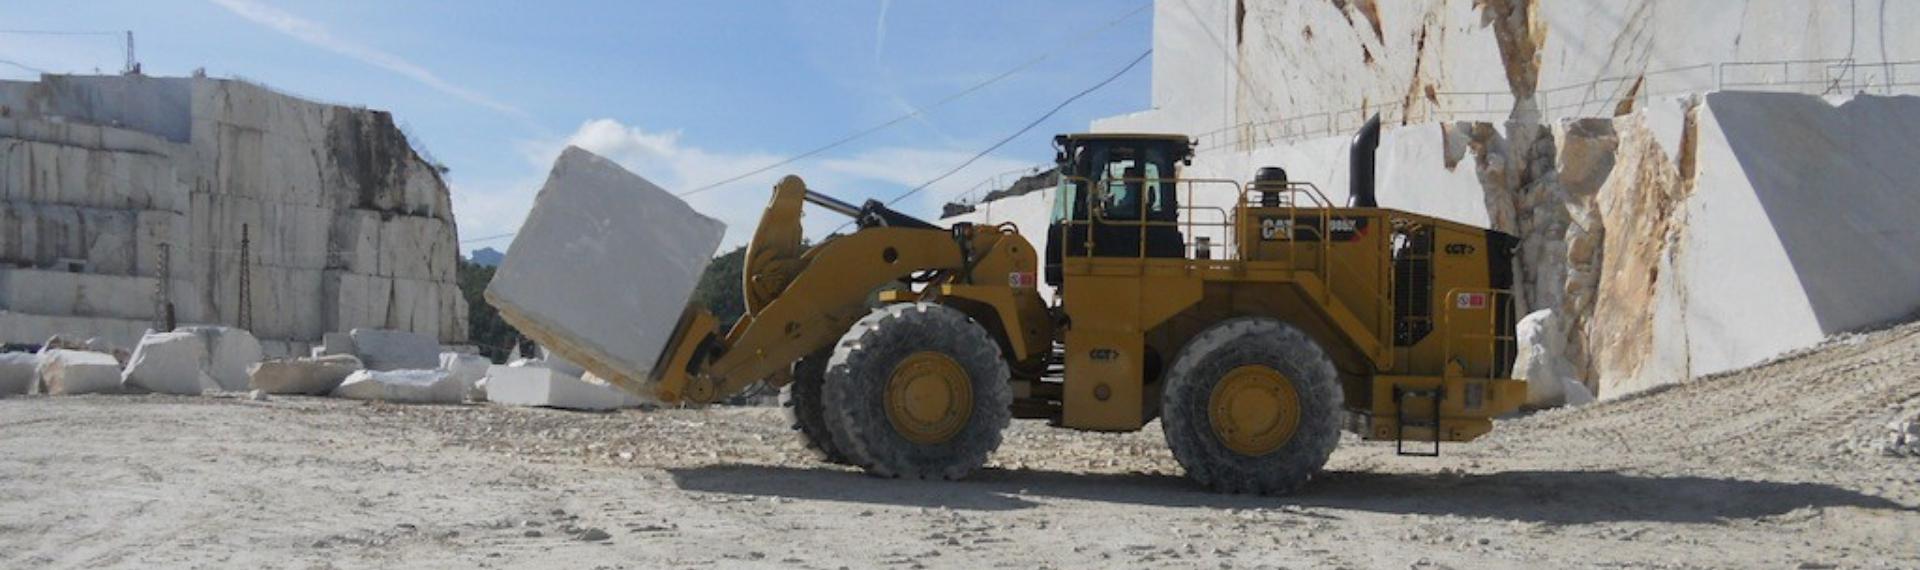 An enormous yellow excavator bucket made in Hardox® 450 steel.